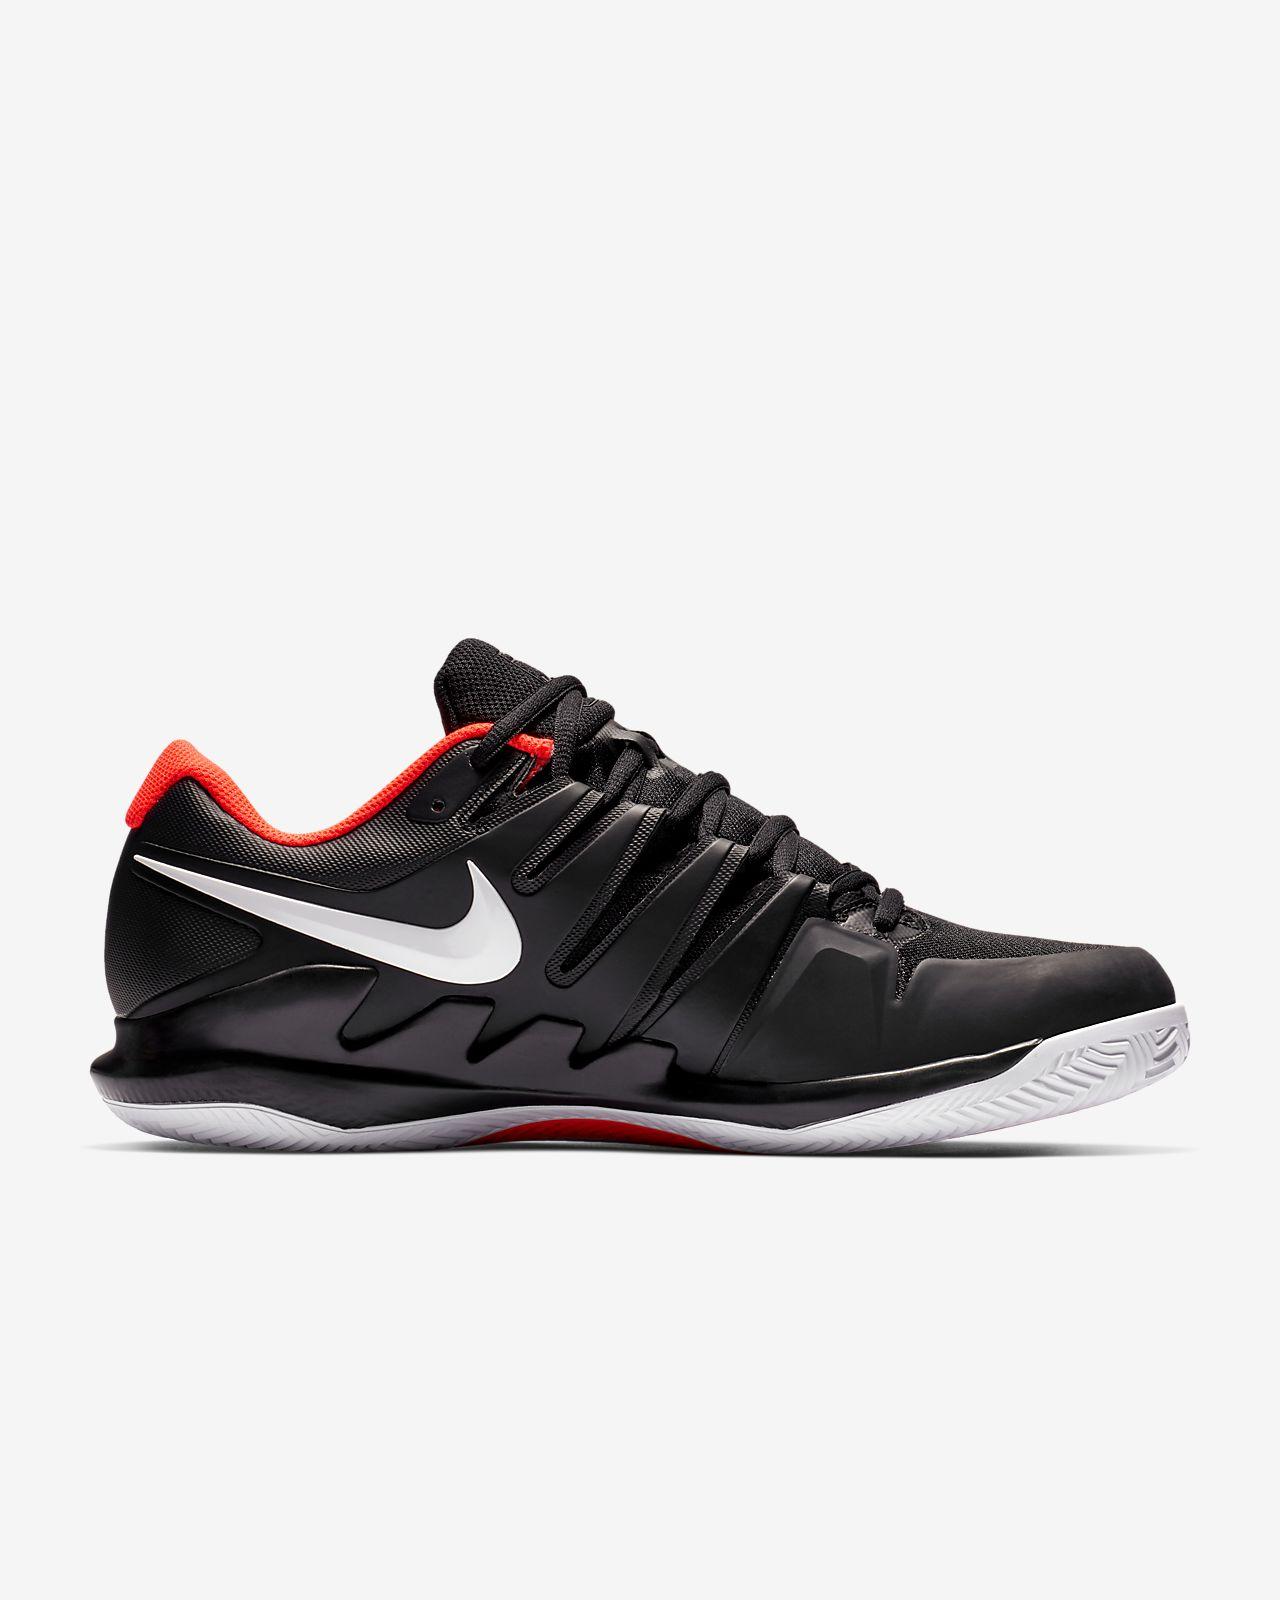 021eb72e4cfa9 Nike Air Zoom Vapor X Clay Men s Tennis Shoe. Nike.com CA